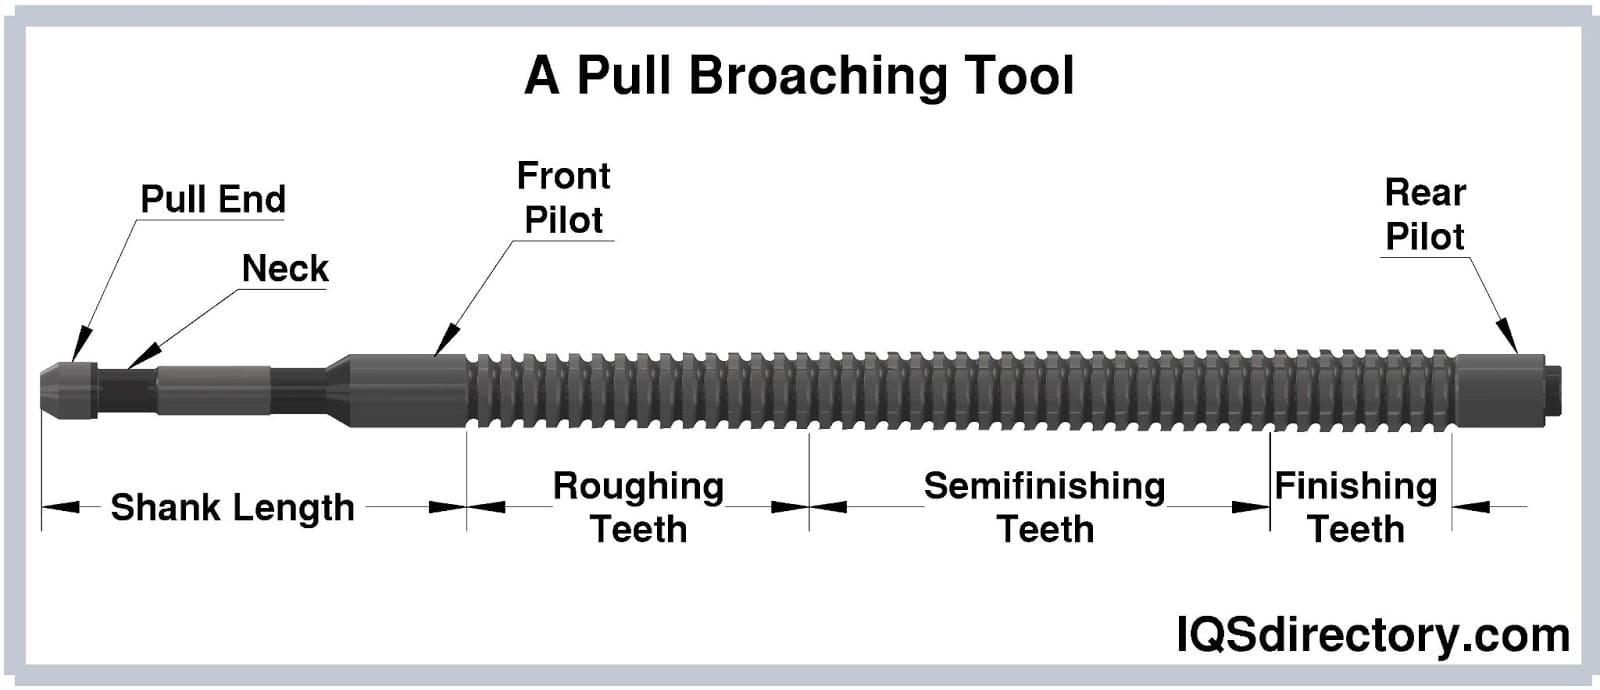 A Pull Broaching Tool